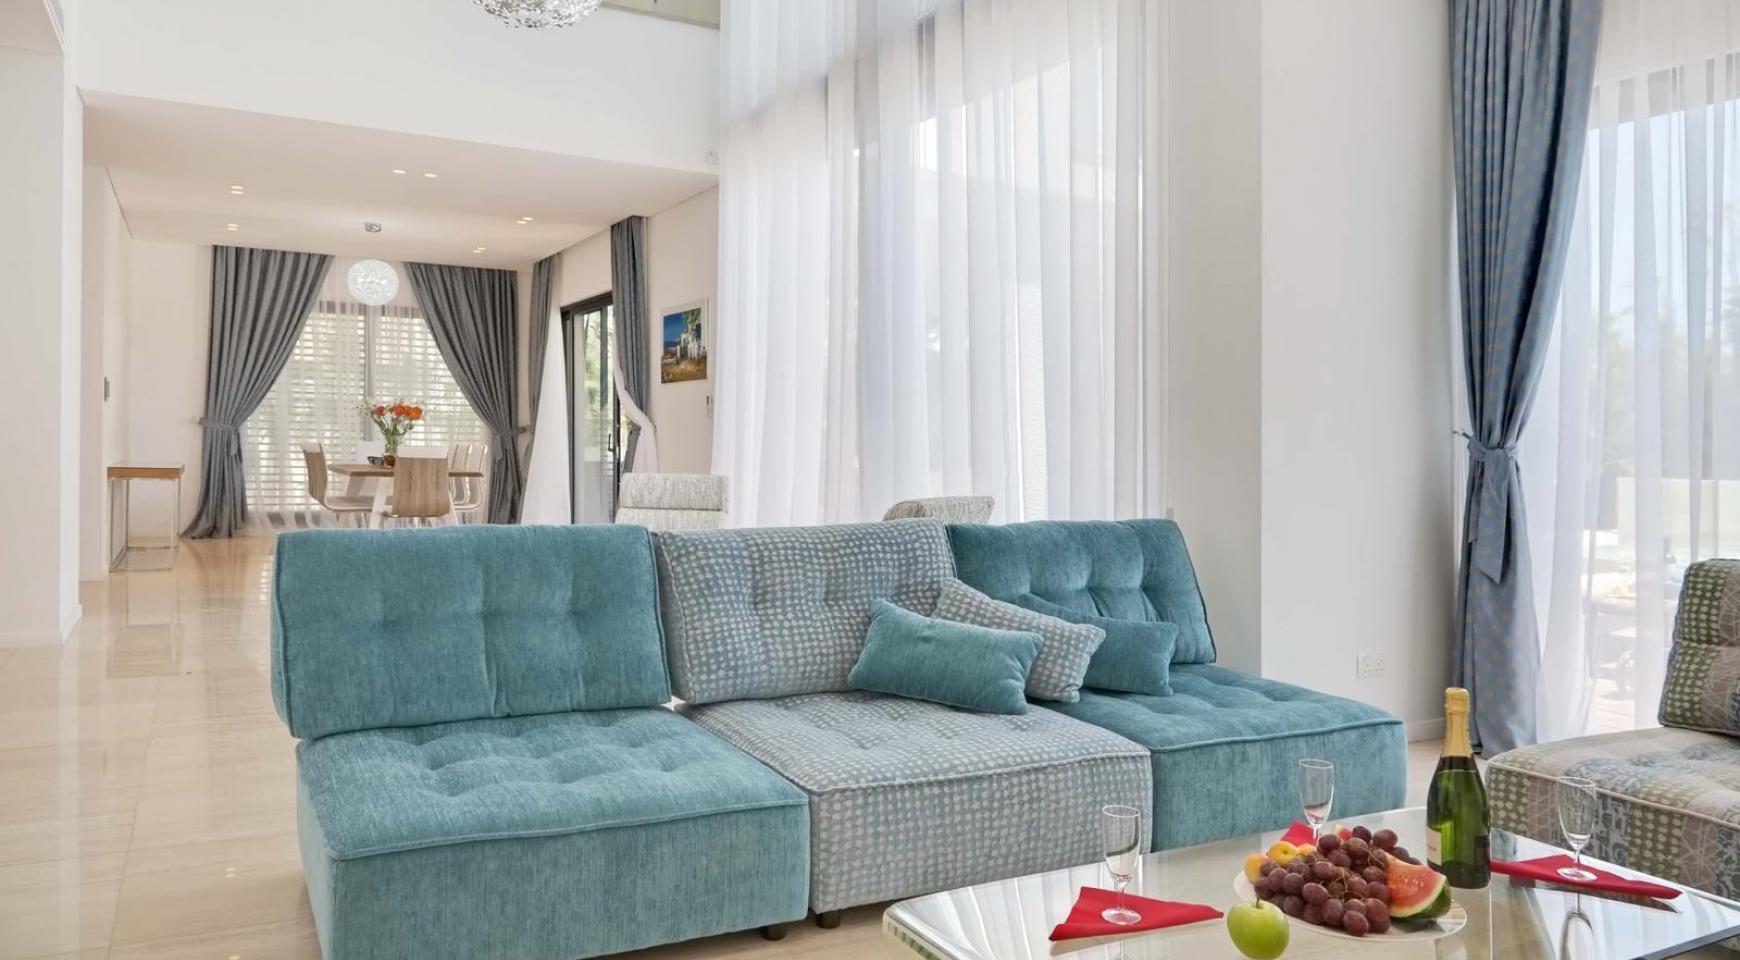 New Luxurious 4 Bedroom Villa in the Tourist Area - 18